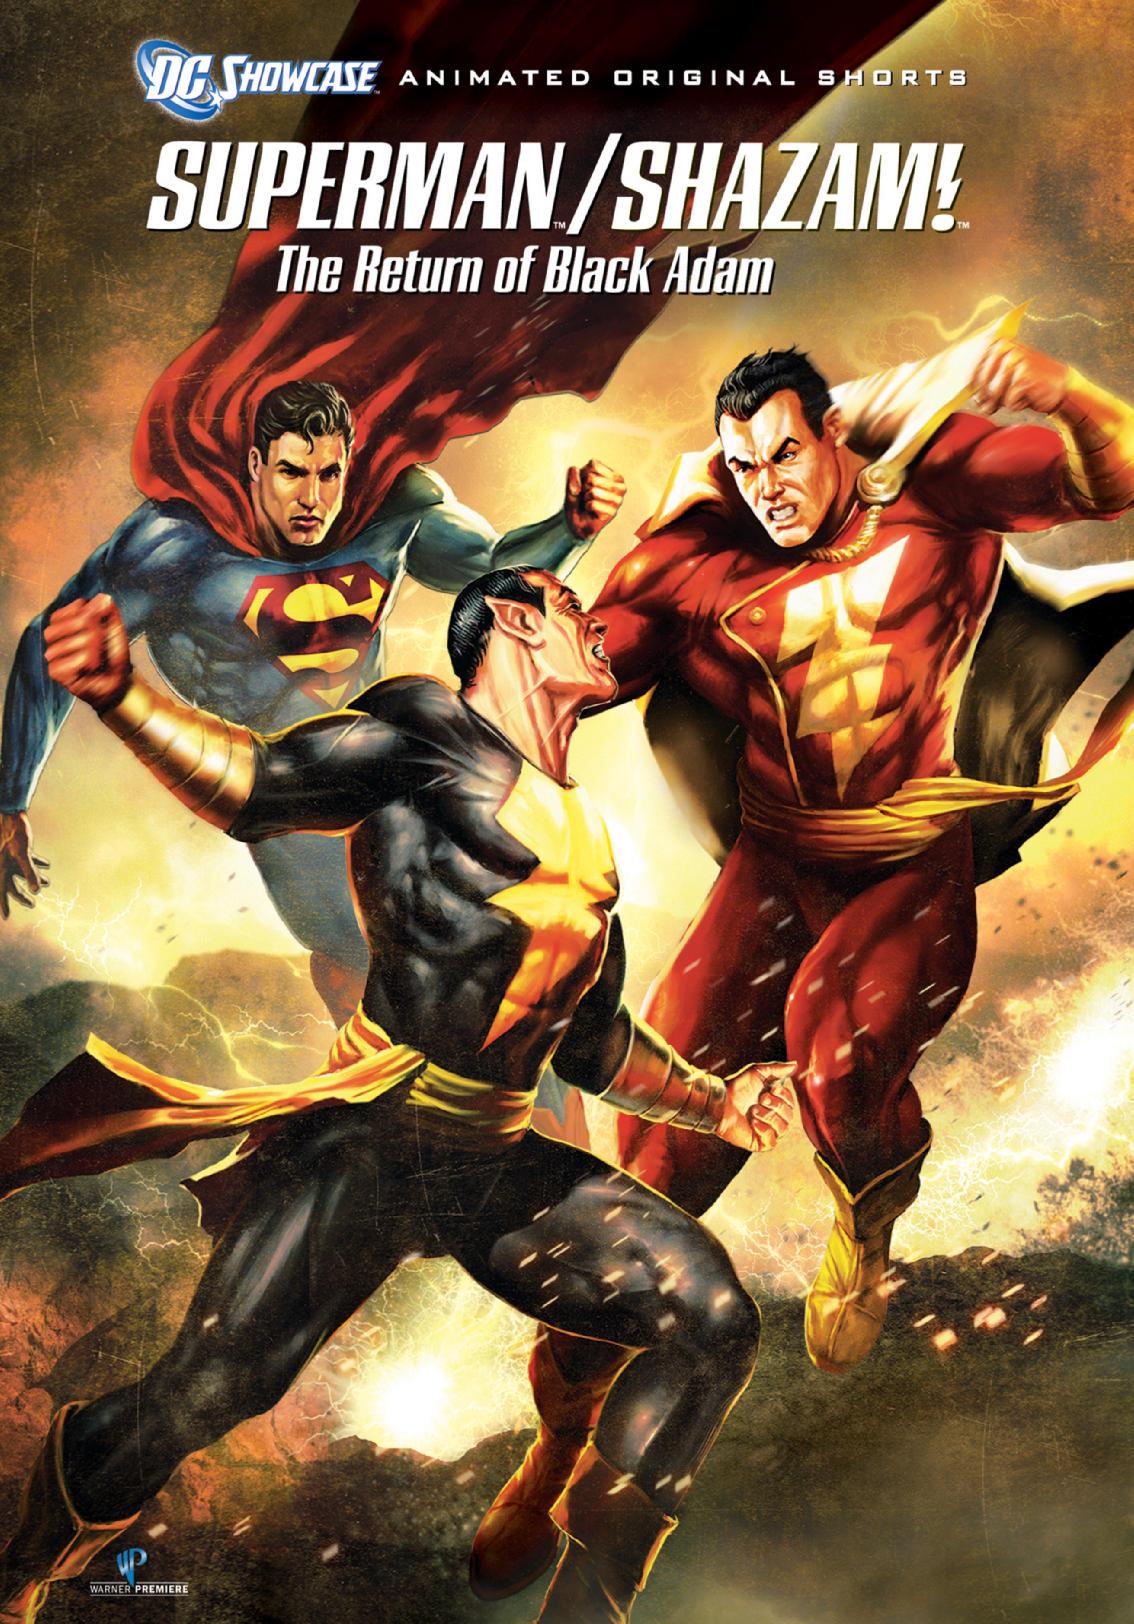 Superman / Shazam!: The Return of Black Adam (2010) | Kaleidescape